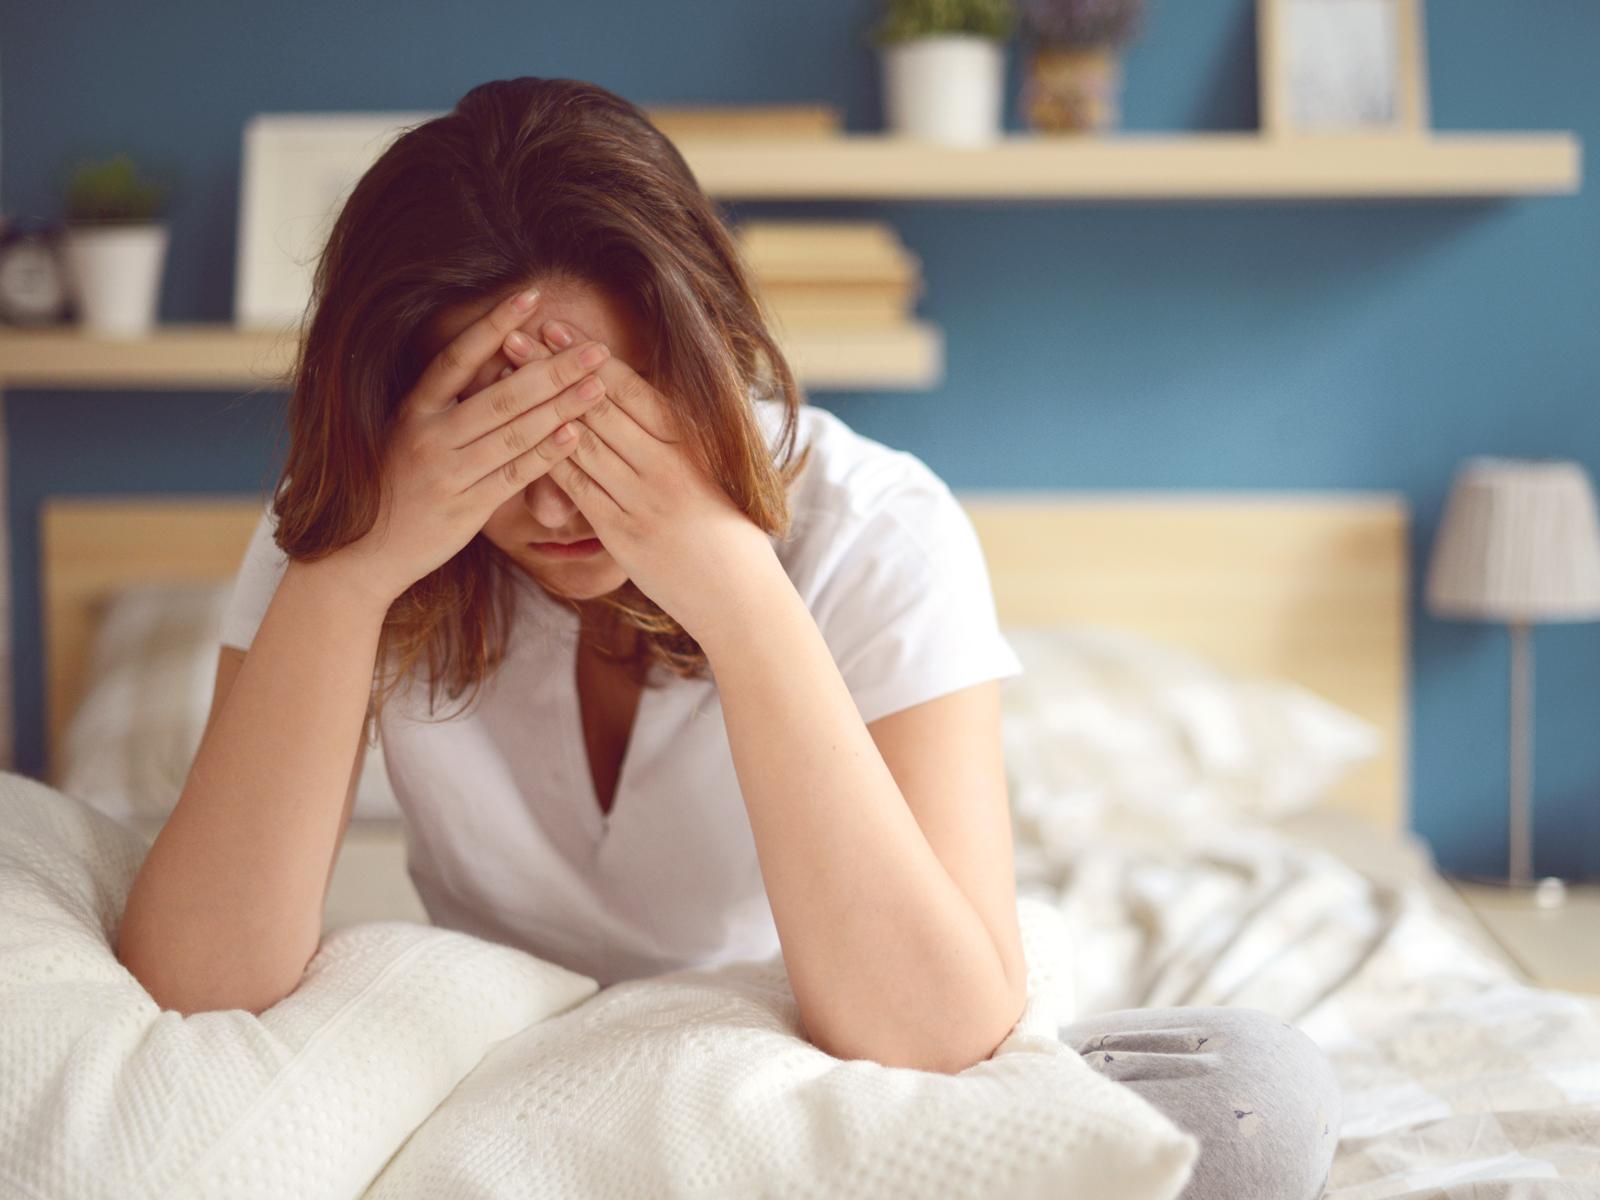 Saiba como identificar e tratar o vaginismo